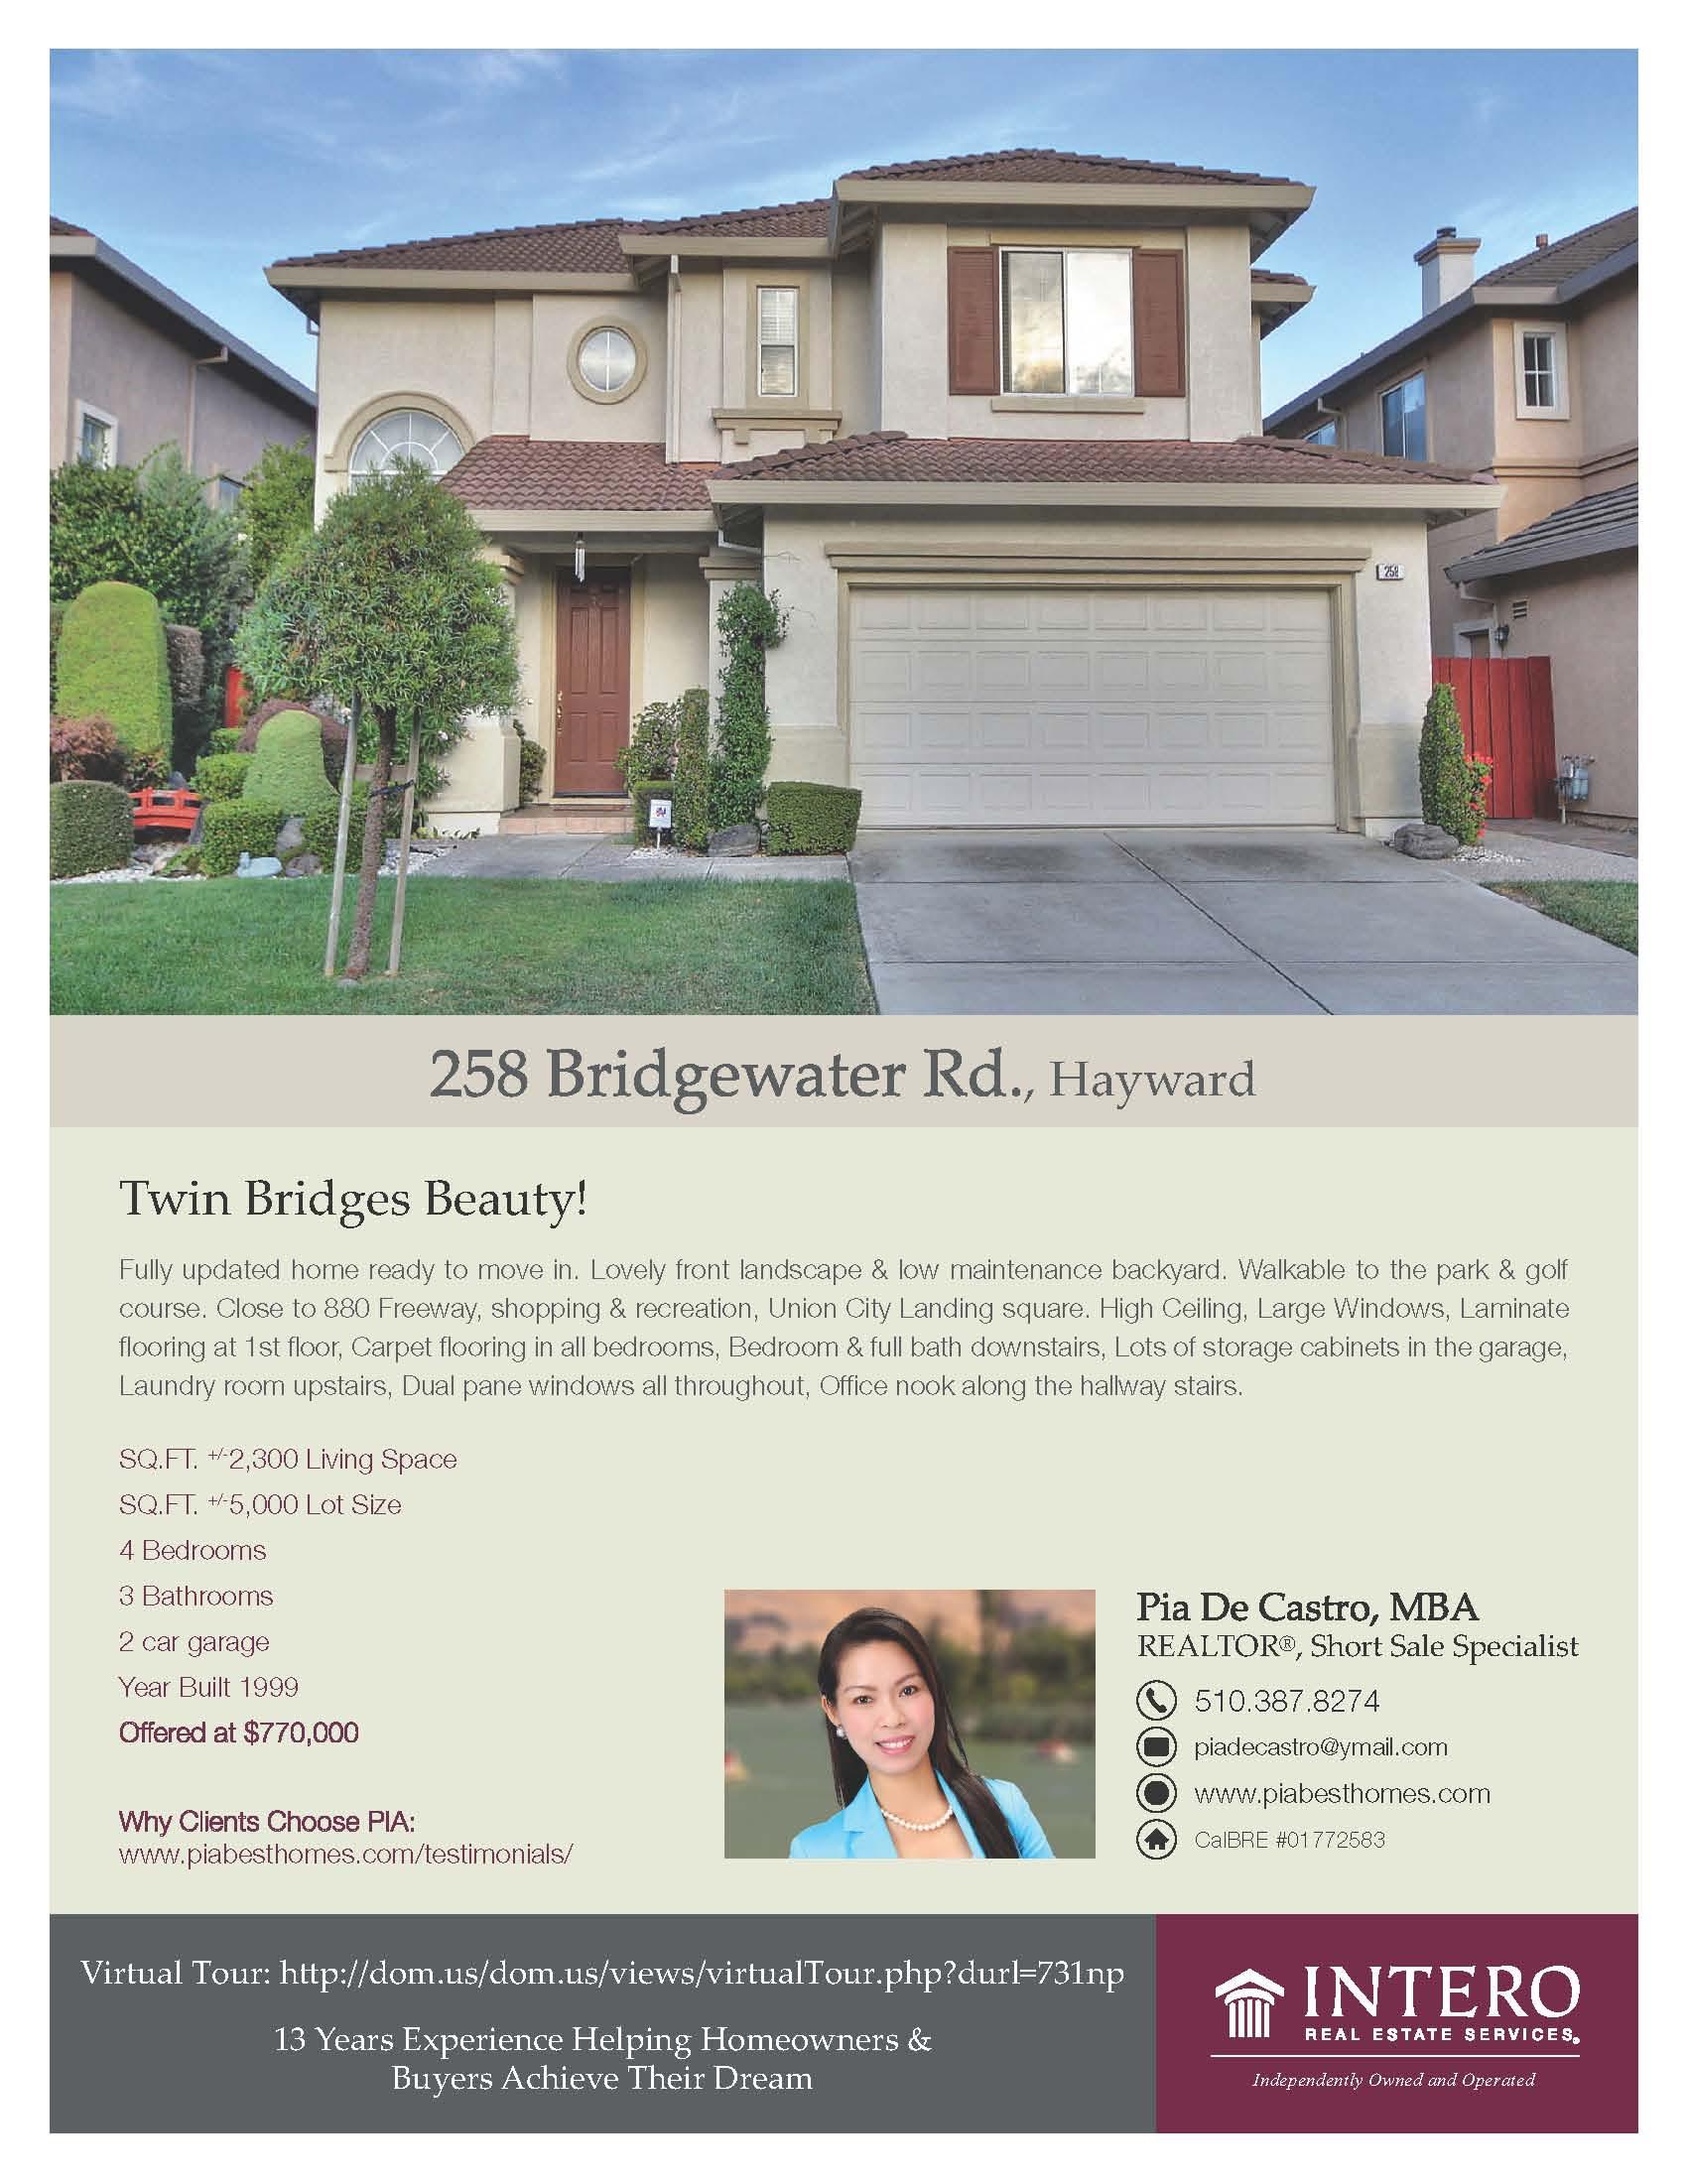 bridgewater_Page_1